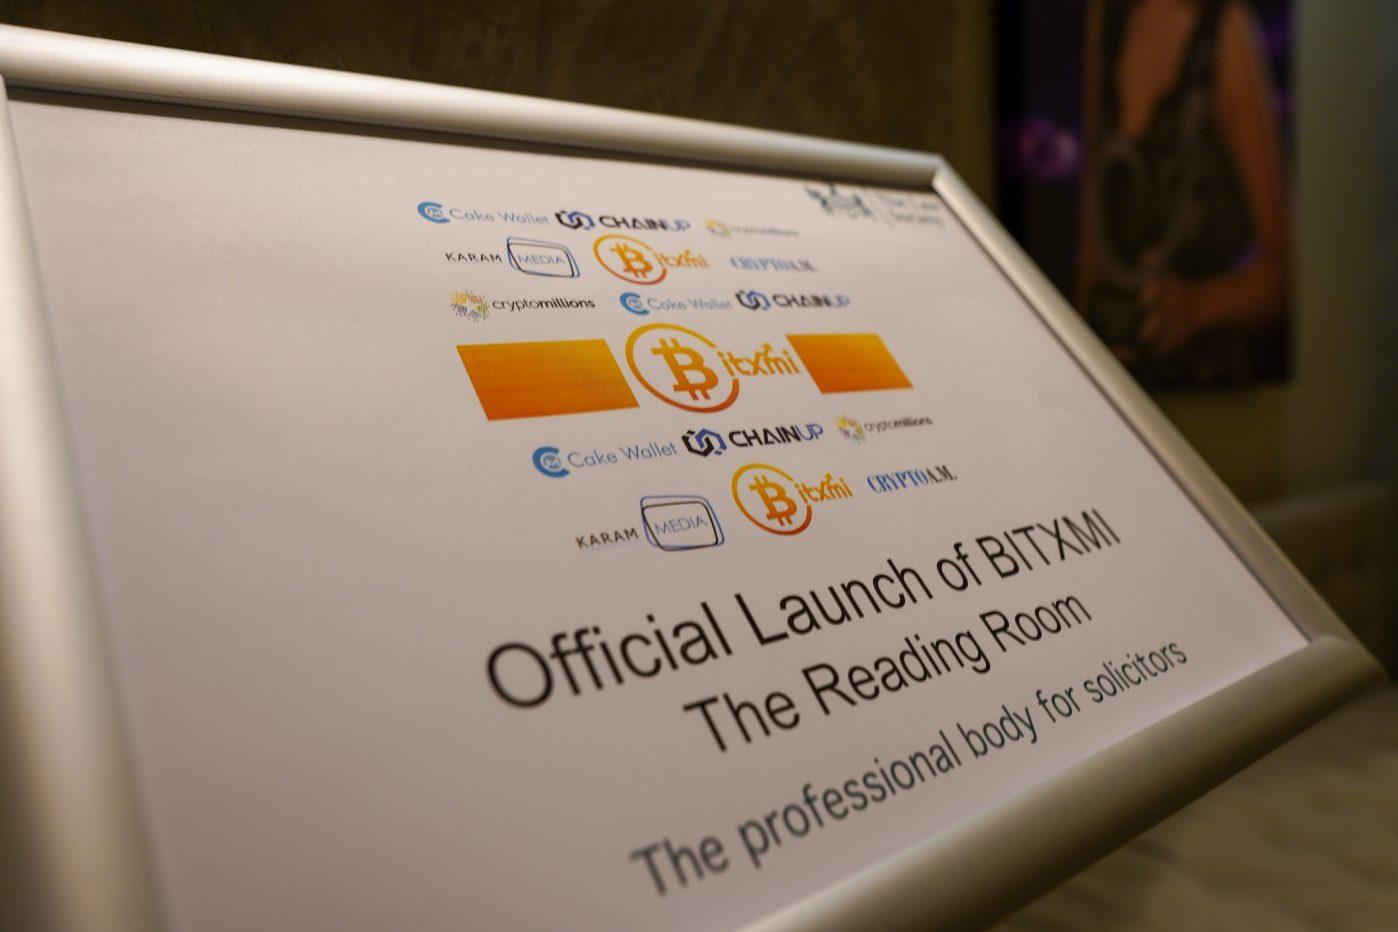 singapore based cryptocurrency exchange